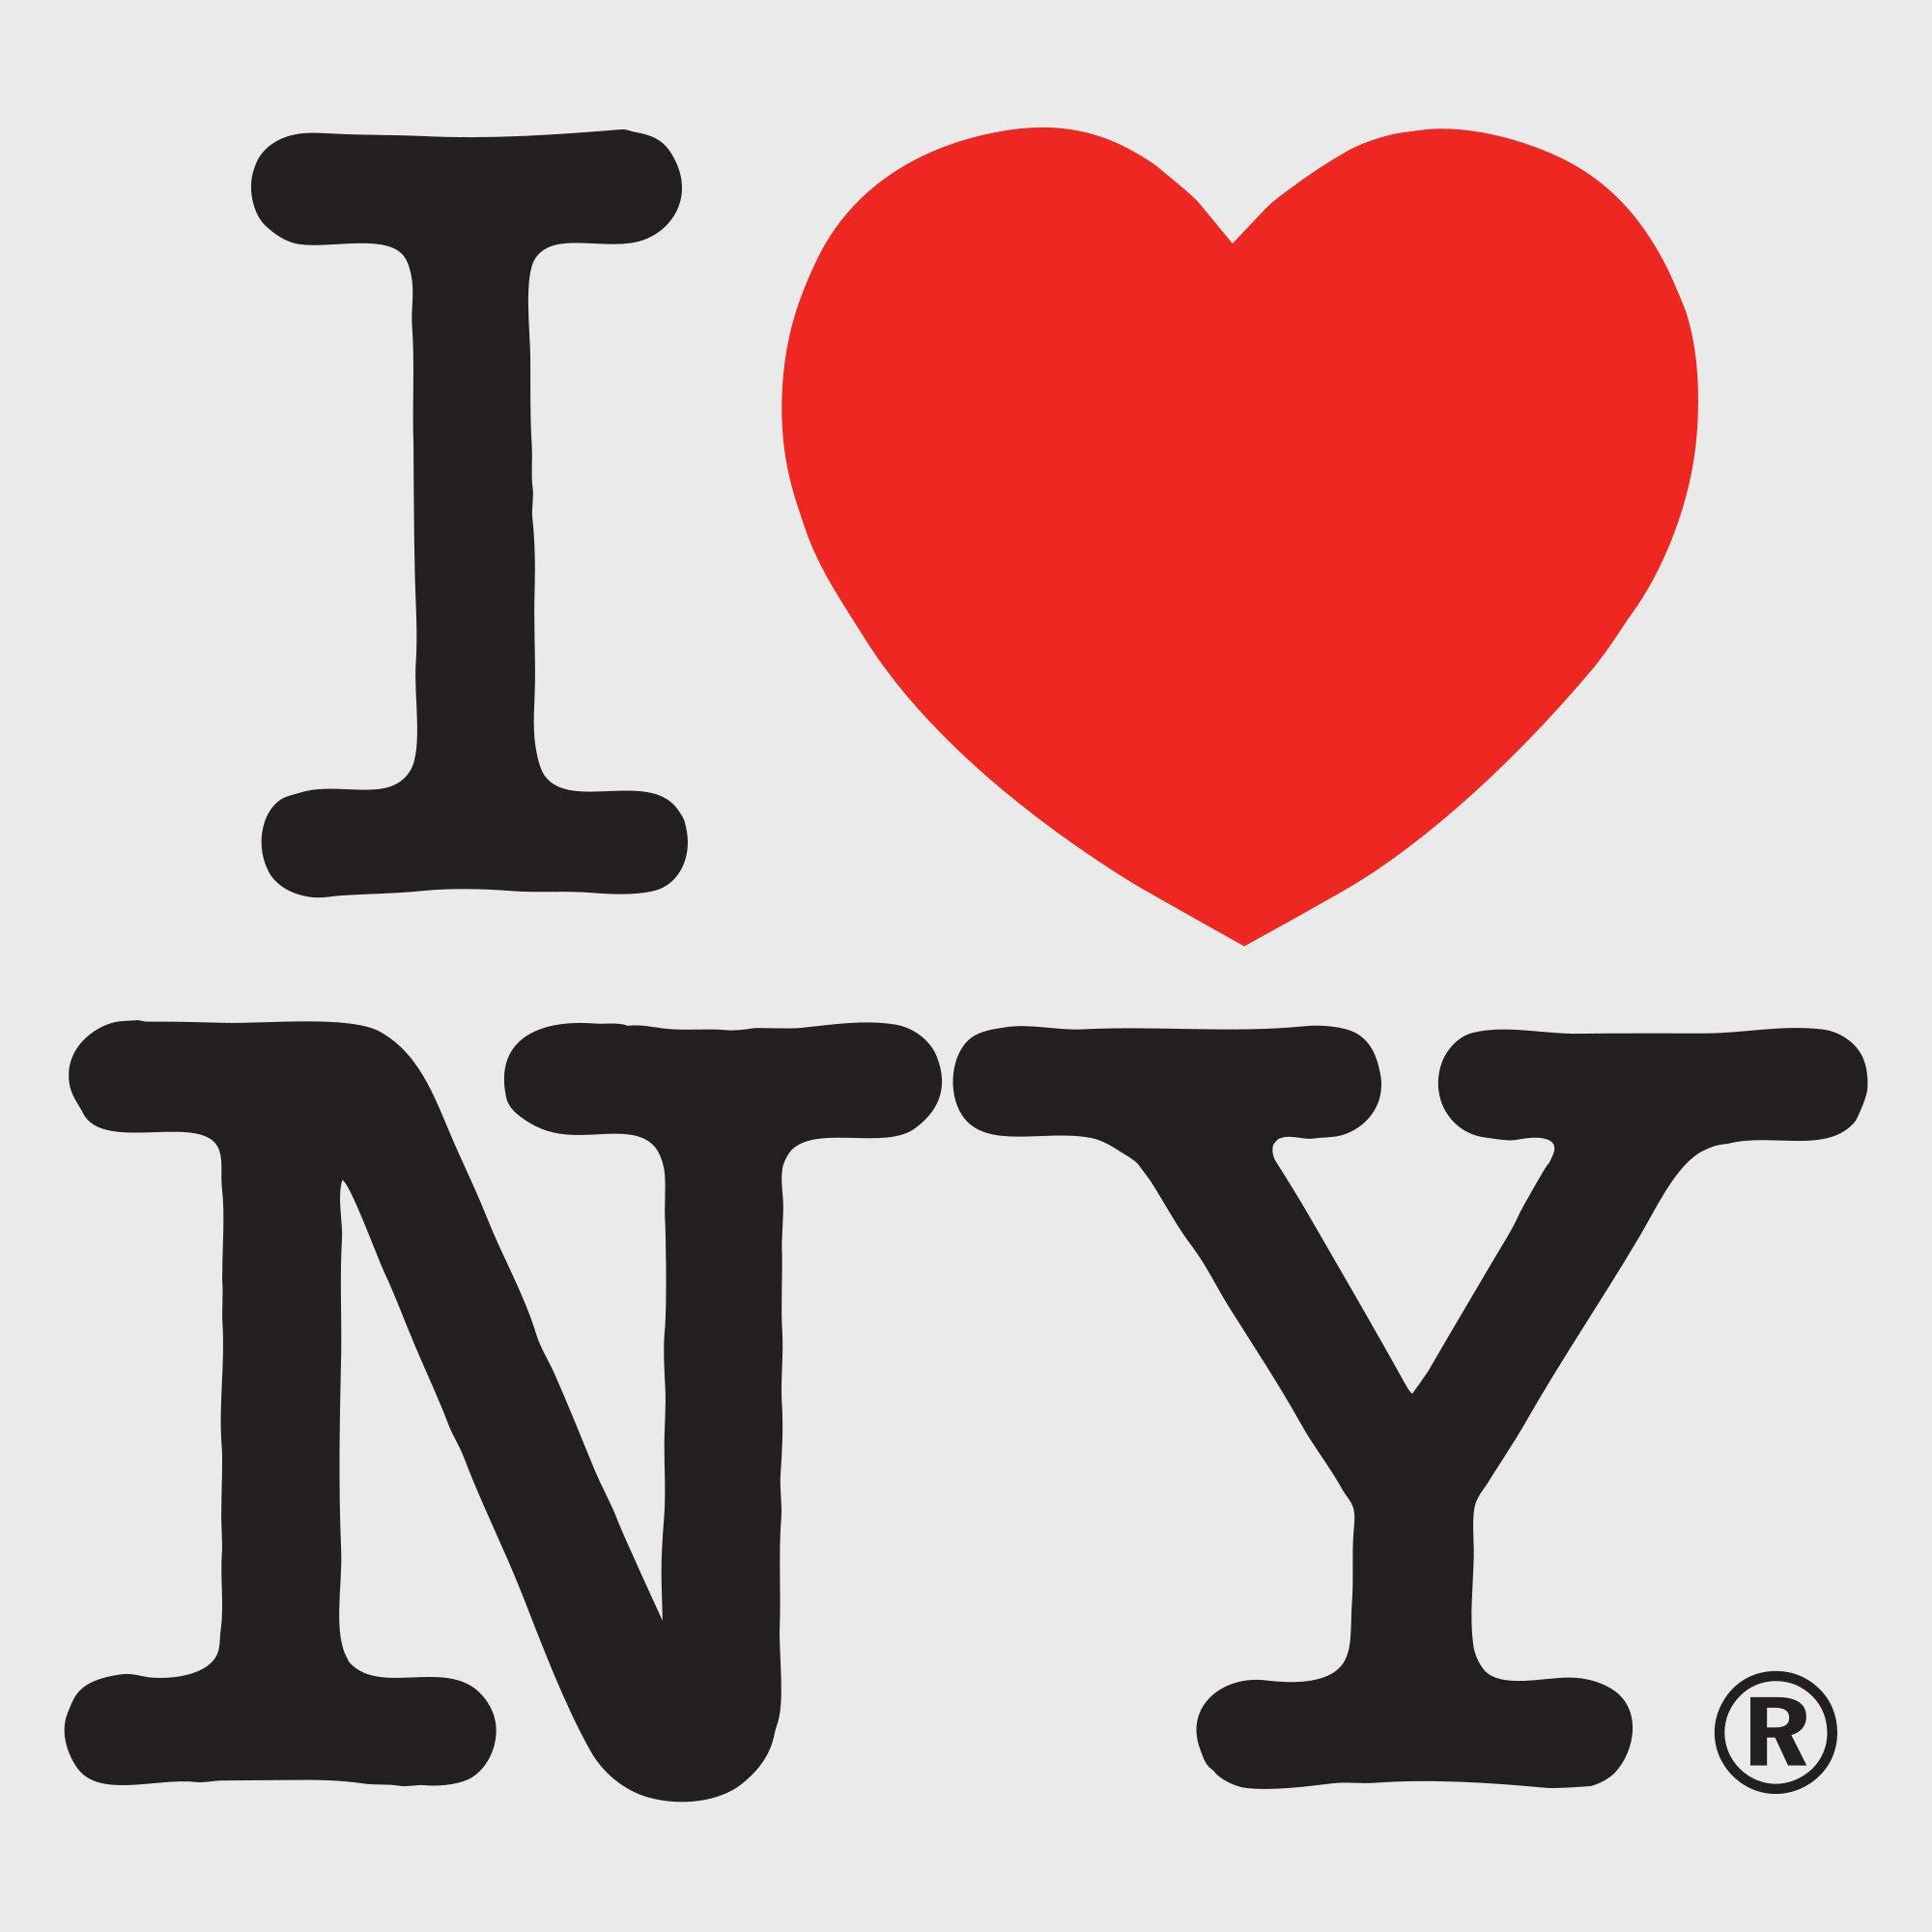 I heart New York logo by Milton Glaser